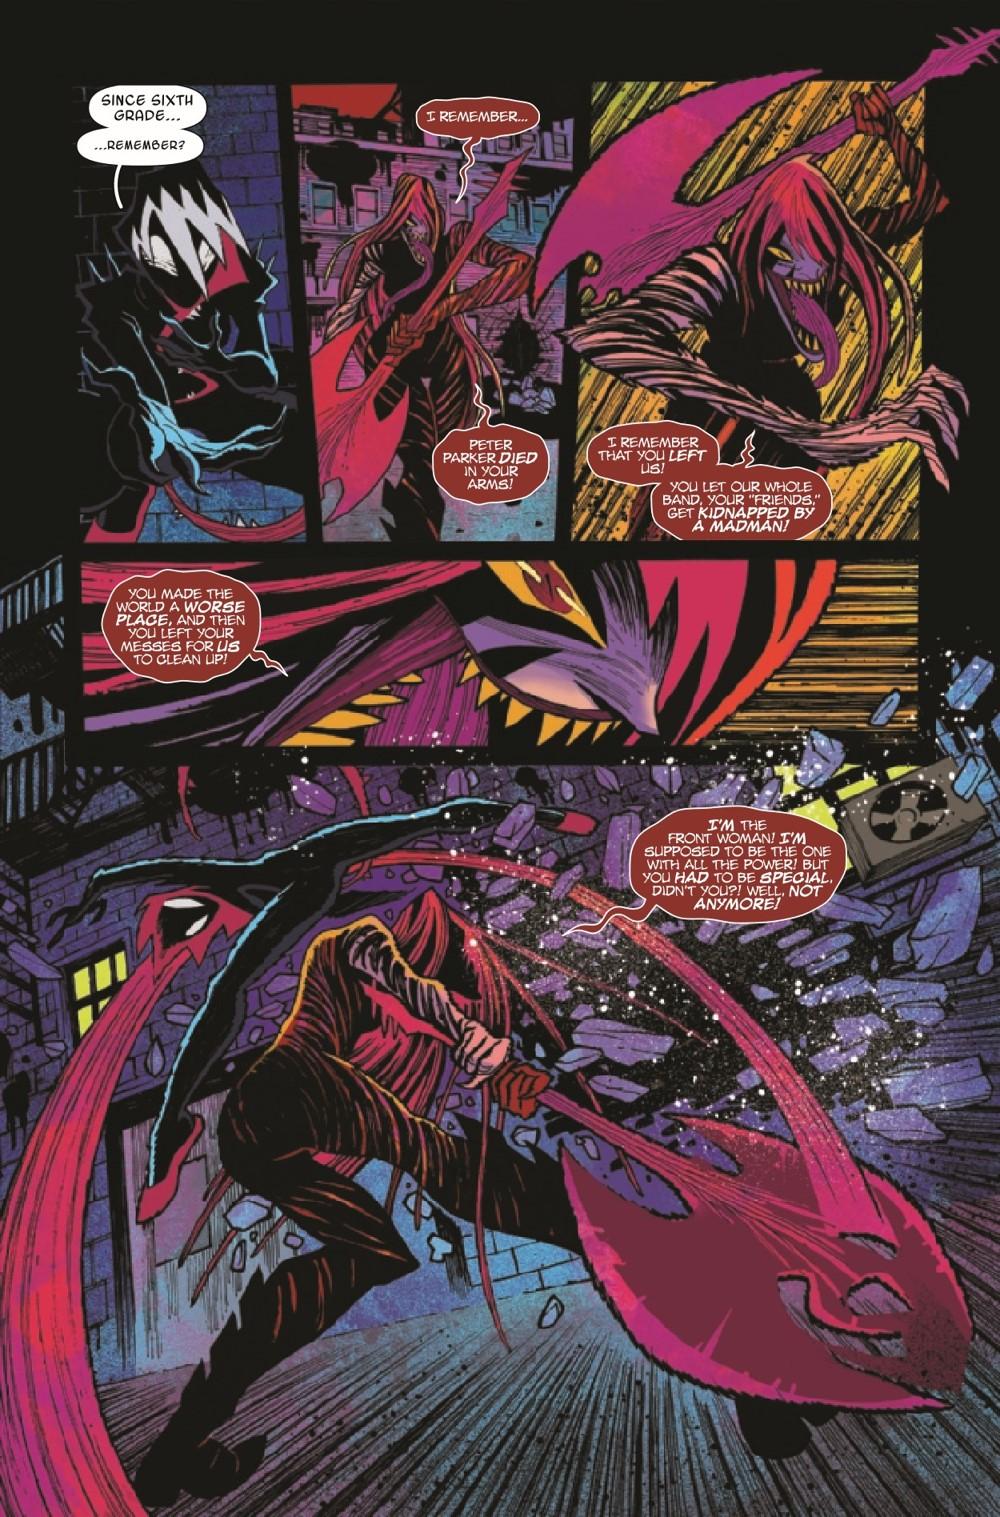 GWENOMVSCARNKIB2021002_Preview-6 ComicList Previews: KING IN BLACK GWENOM VS CARNAGE #2 (OF 3)